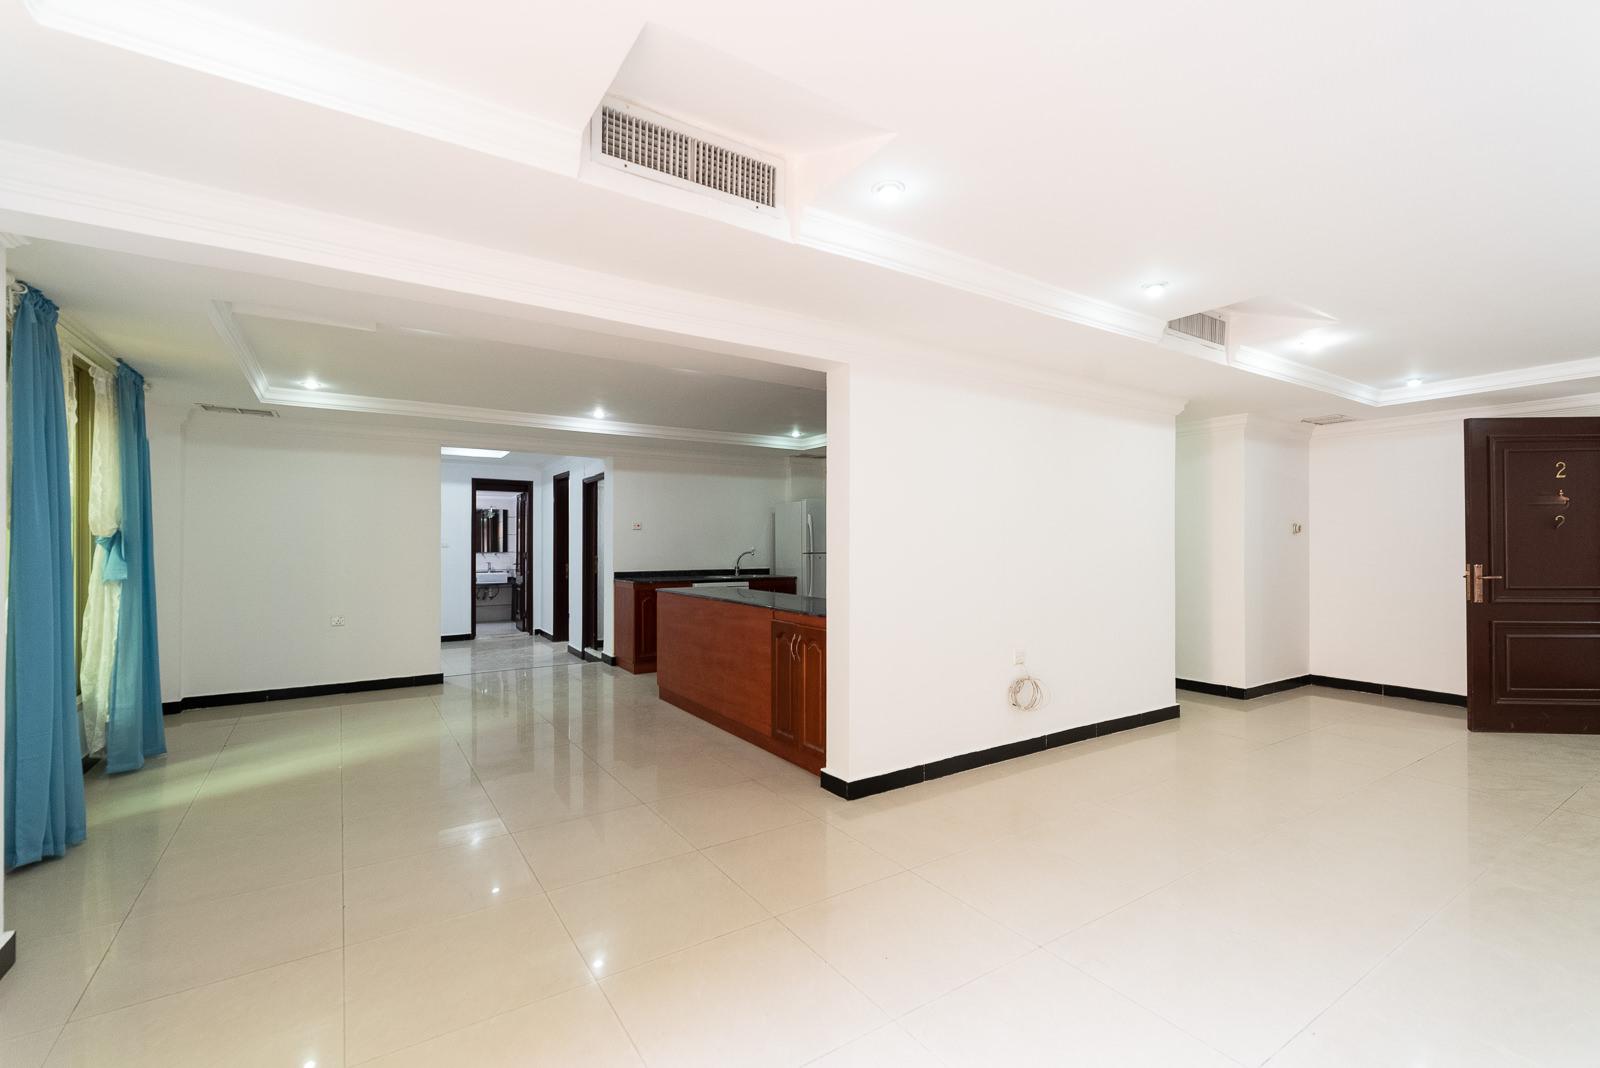 Salwa – unfurnished, three bedroom basement apartment w/private yard